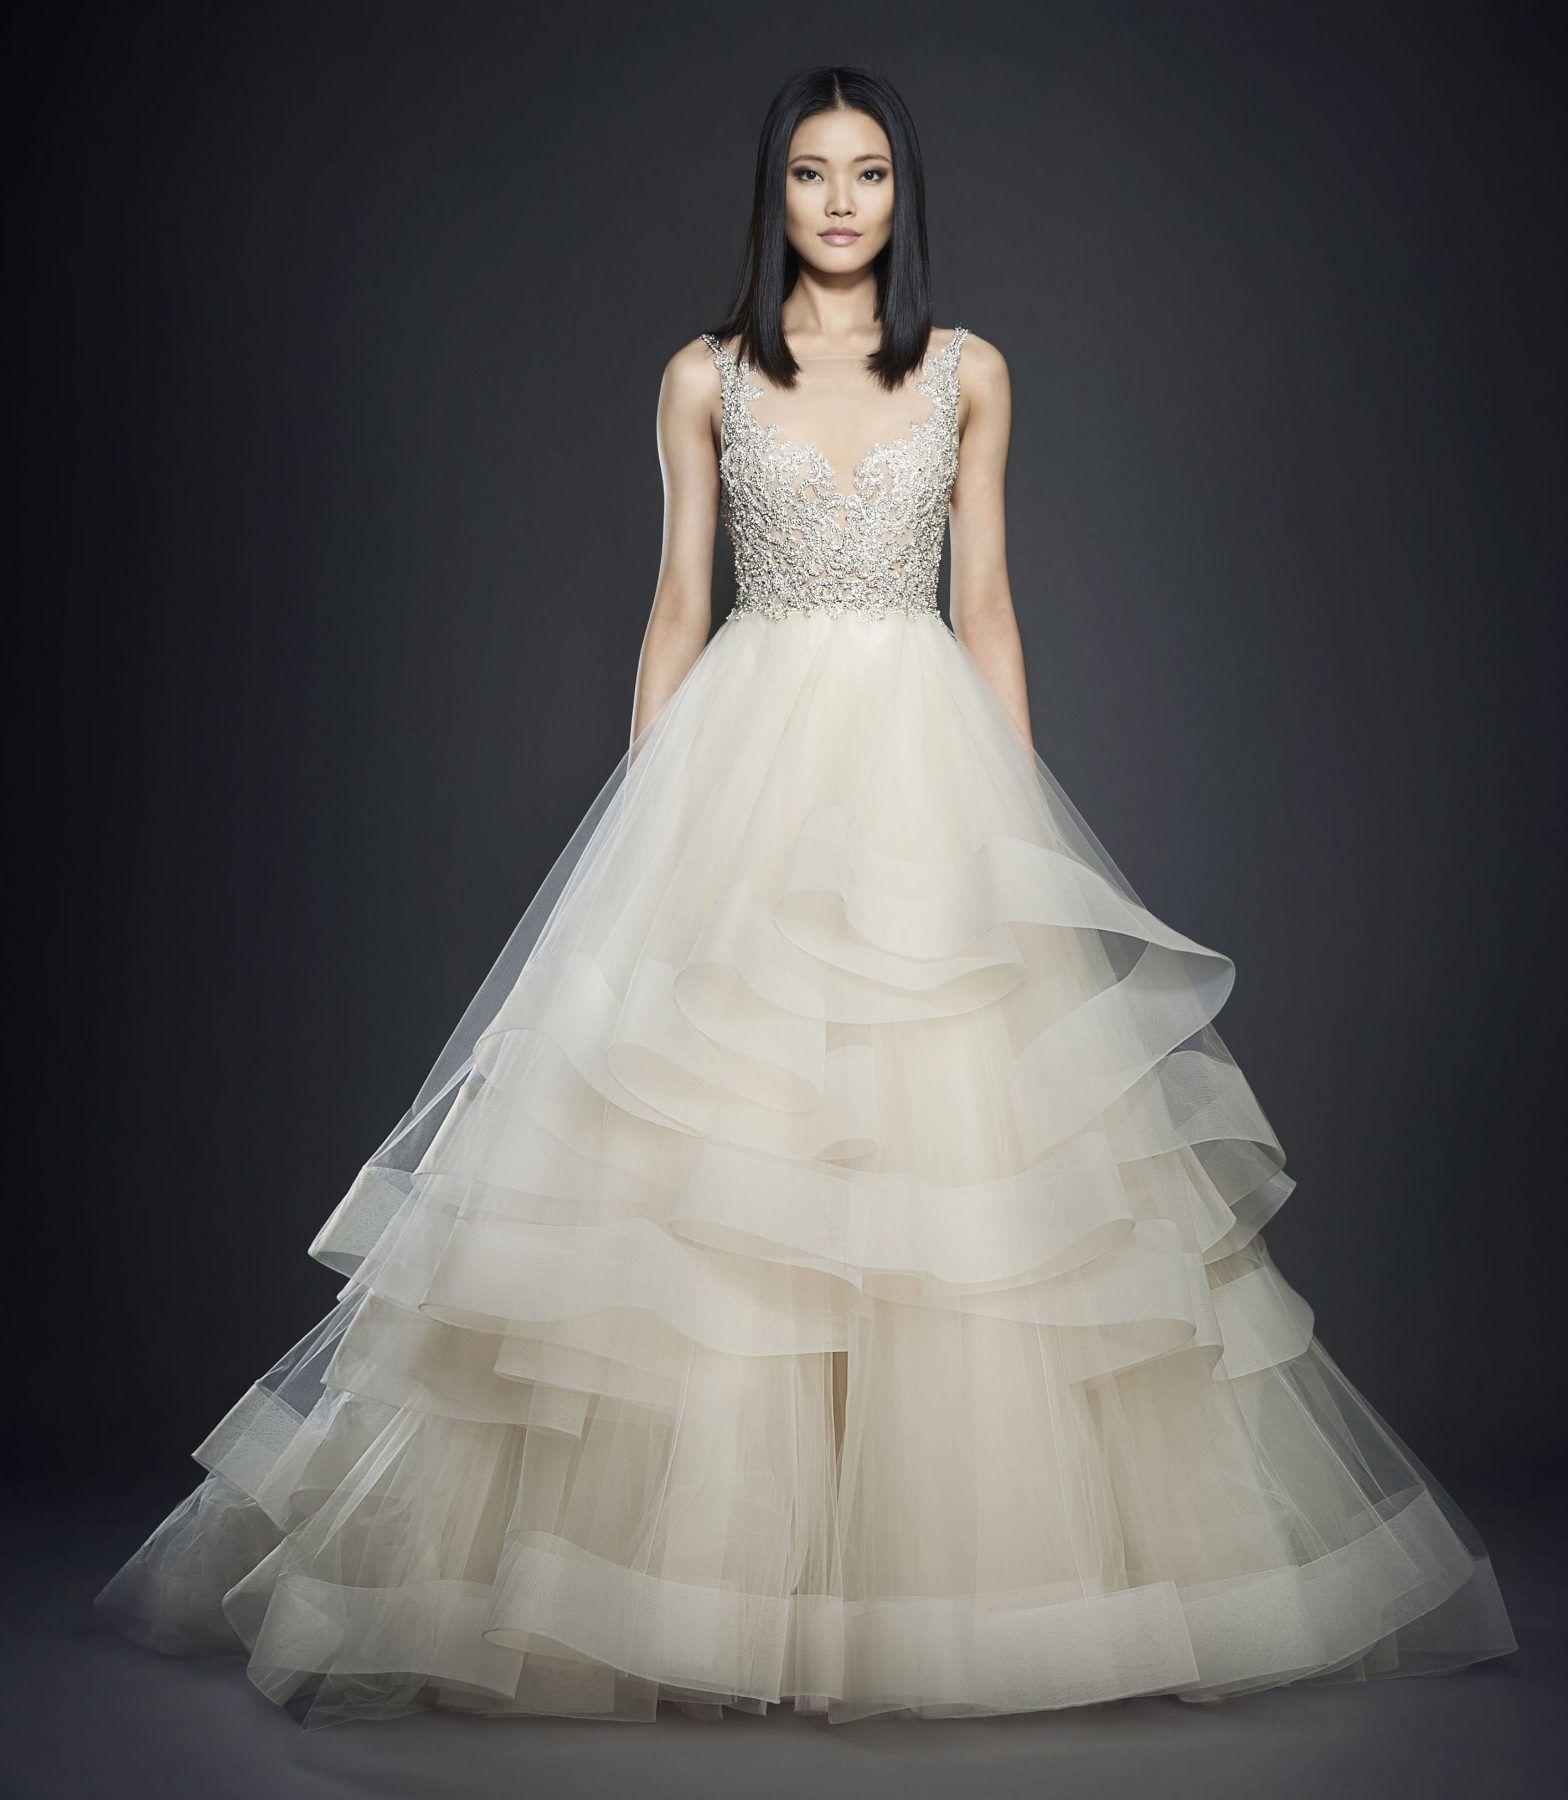 Harry potter wedding dress  Romantic Ball Gown Wedding Dress by Lazaro  Image   Harry Potter